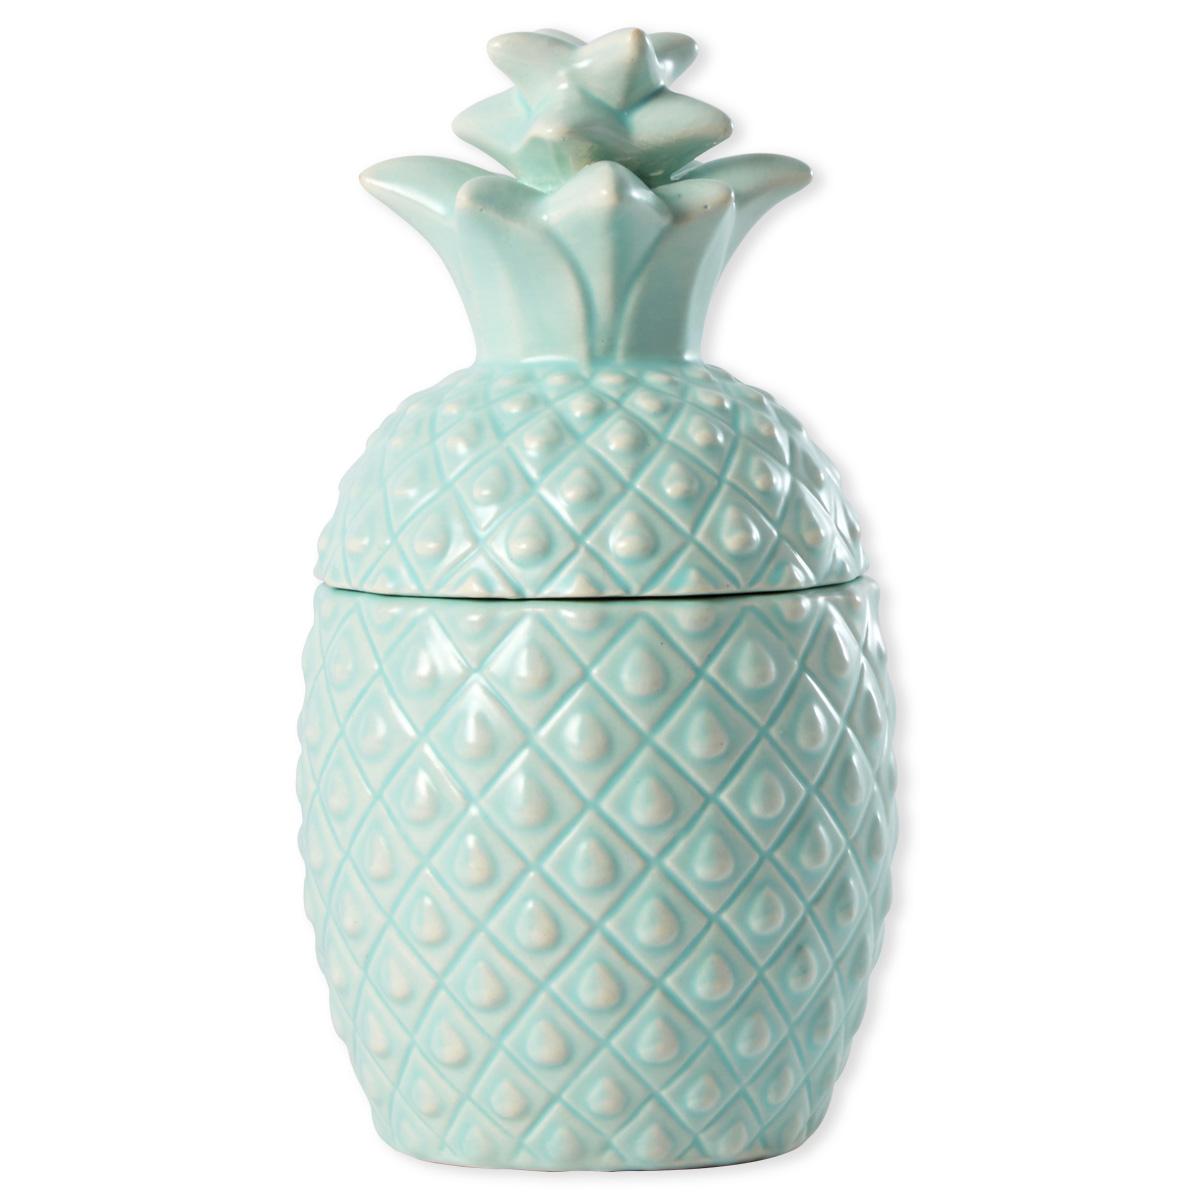 Bonbonni re en forme d 39 ananas objet d co scandinave for Objet deco ananas